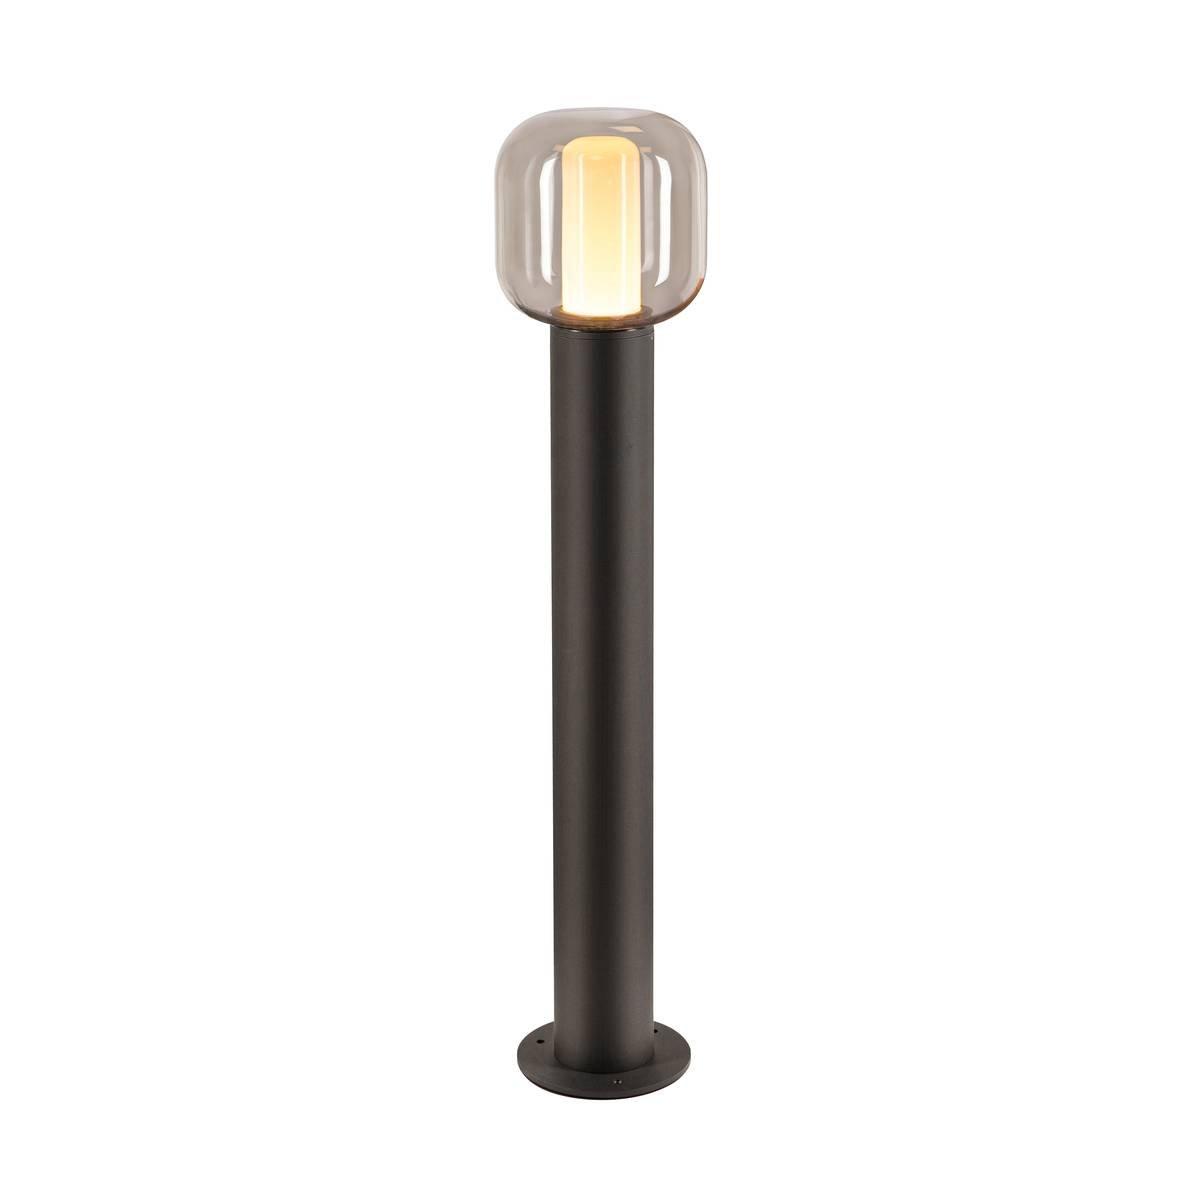 SLV verlichting Design staande lamp Ovalisk 1004680